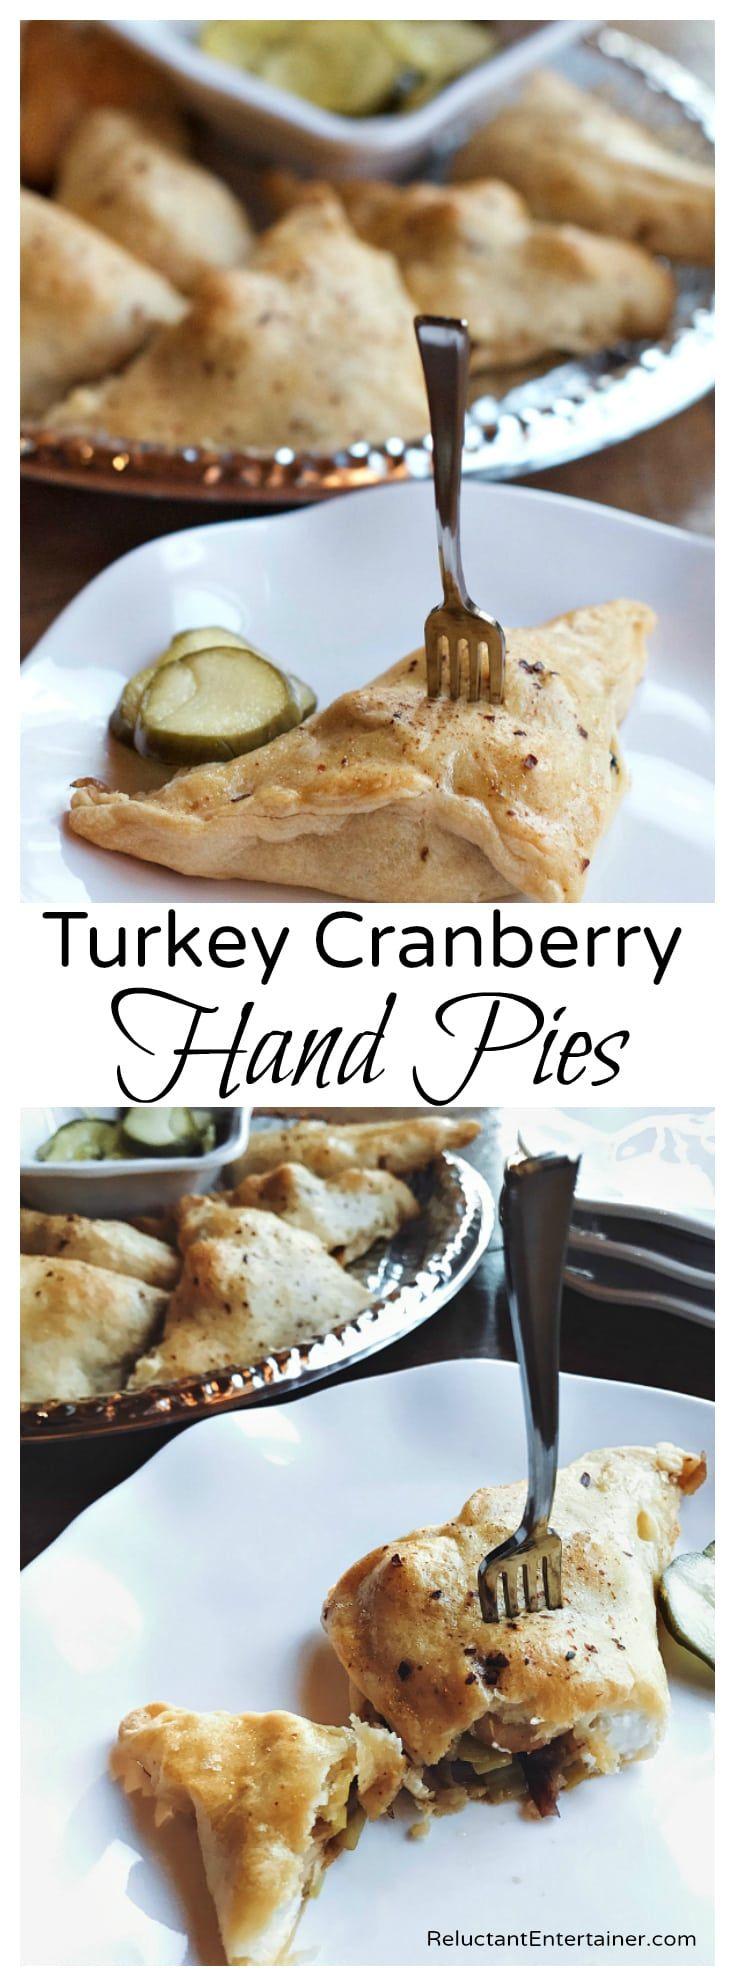 Turkey Cranberry Hand Pies